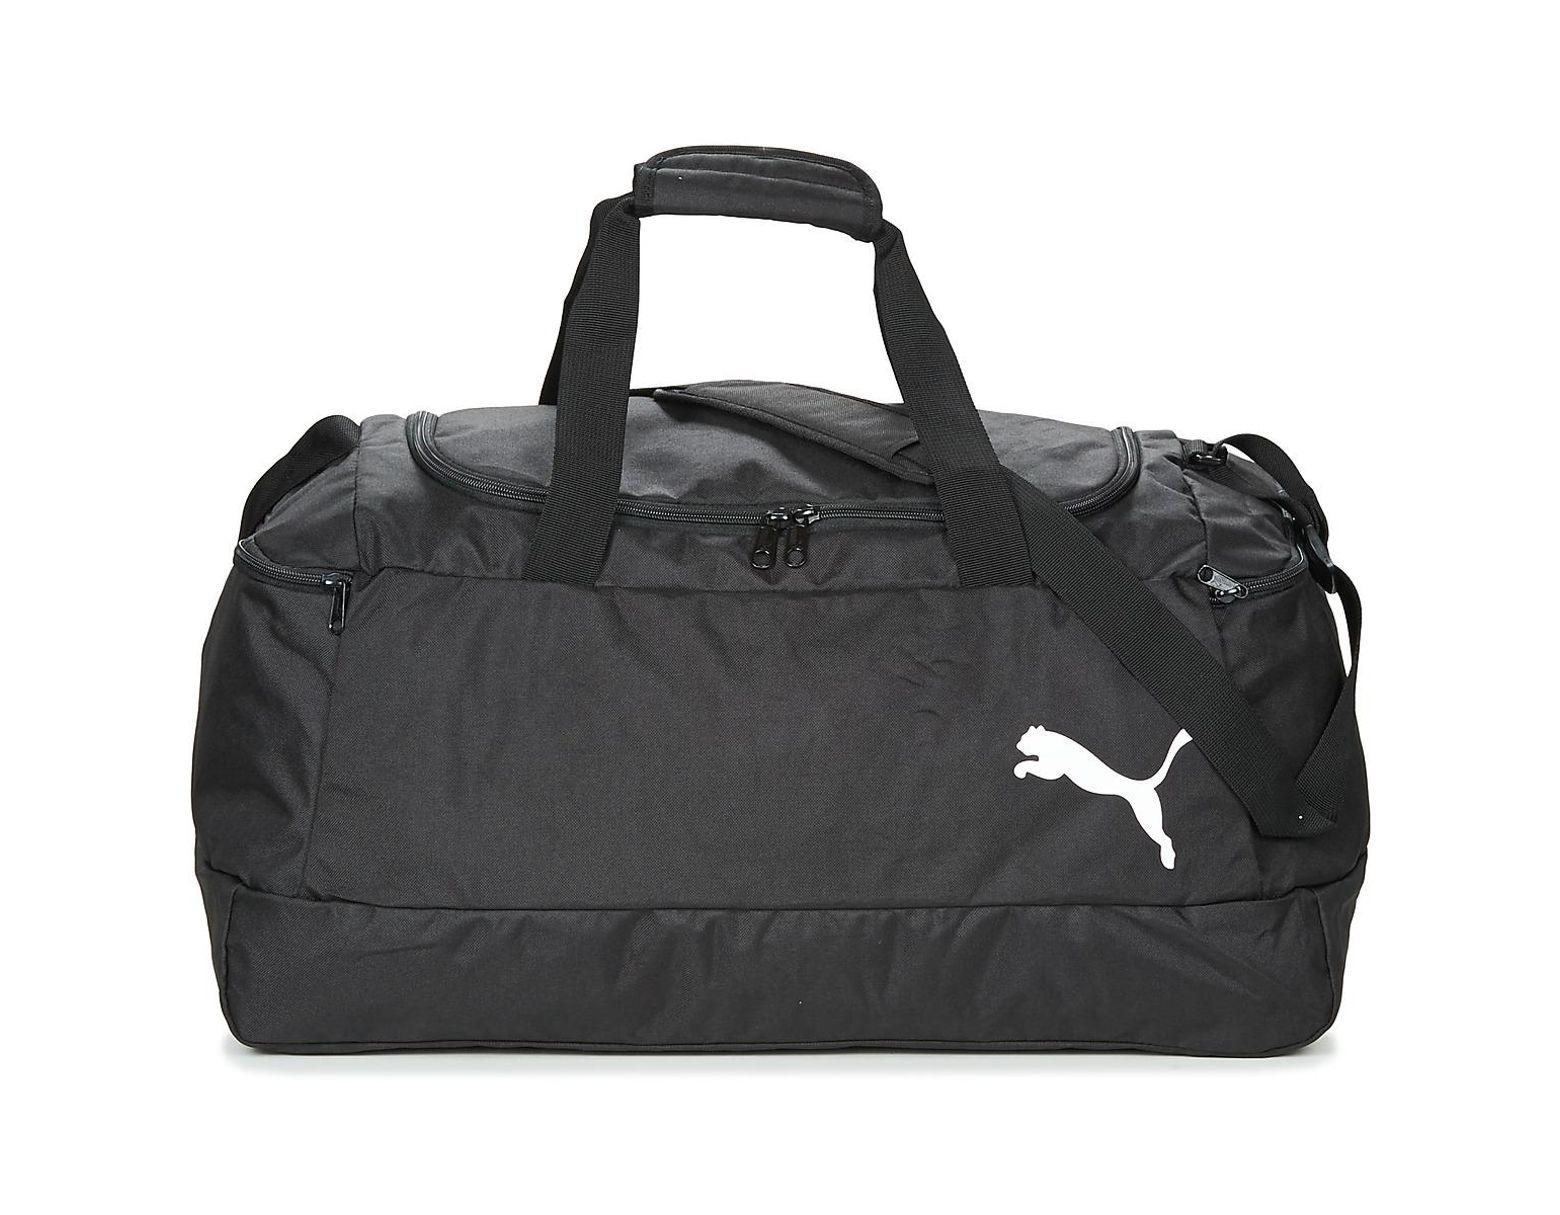 Pro Training Pour Femmes Puma Sac Ii Bag Sport Noir De En Medium tQdhrs